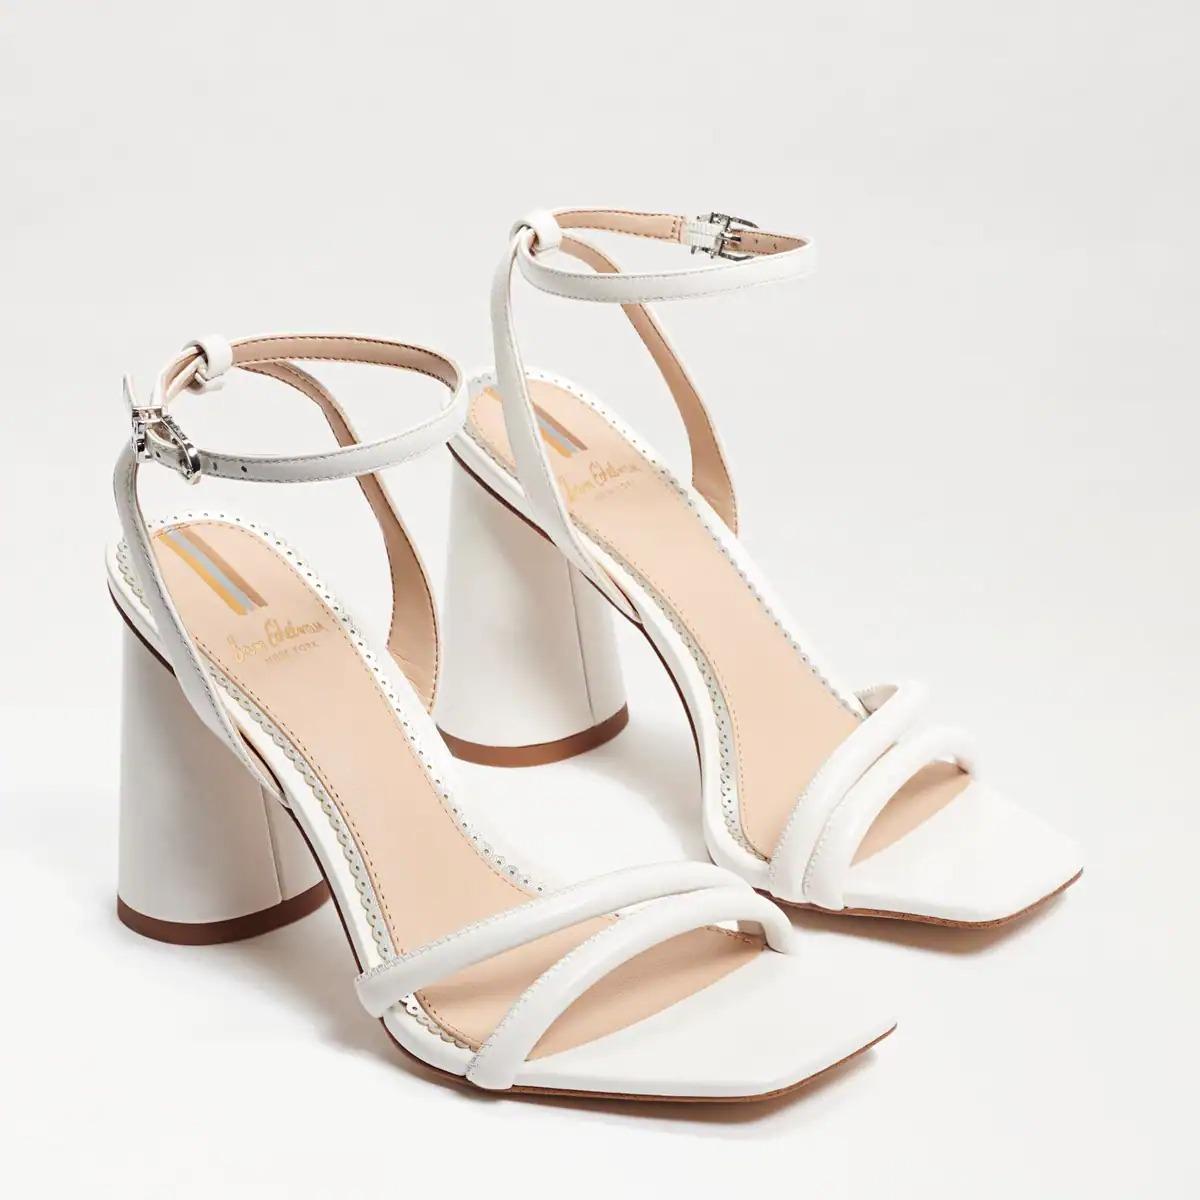 chunky block white sandal heel Sam Edelman wedding shoes